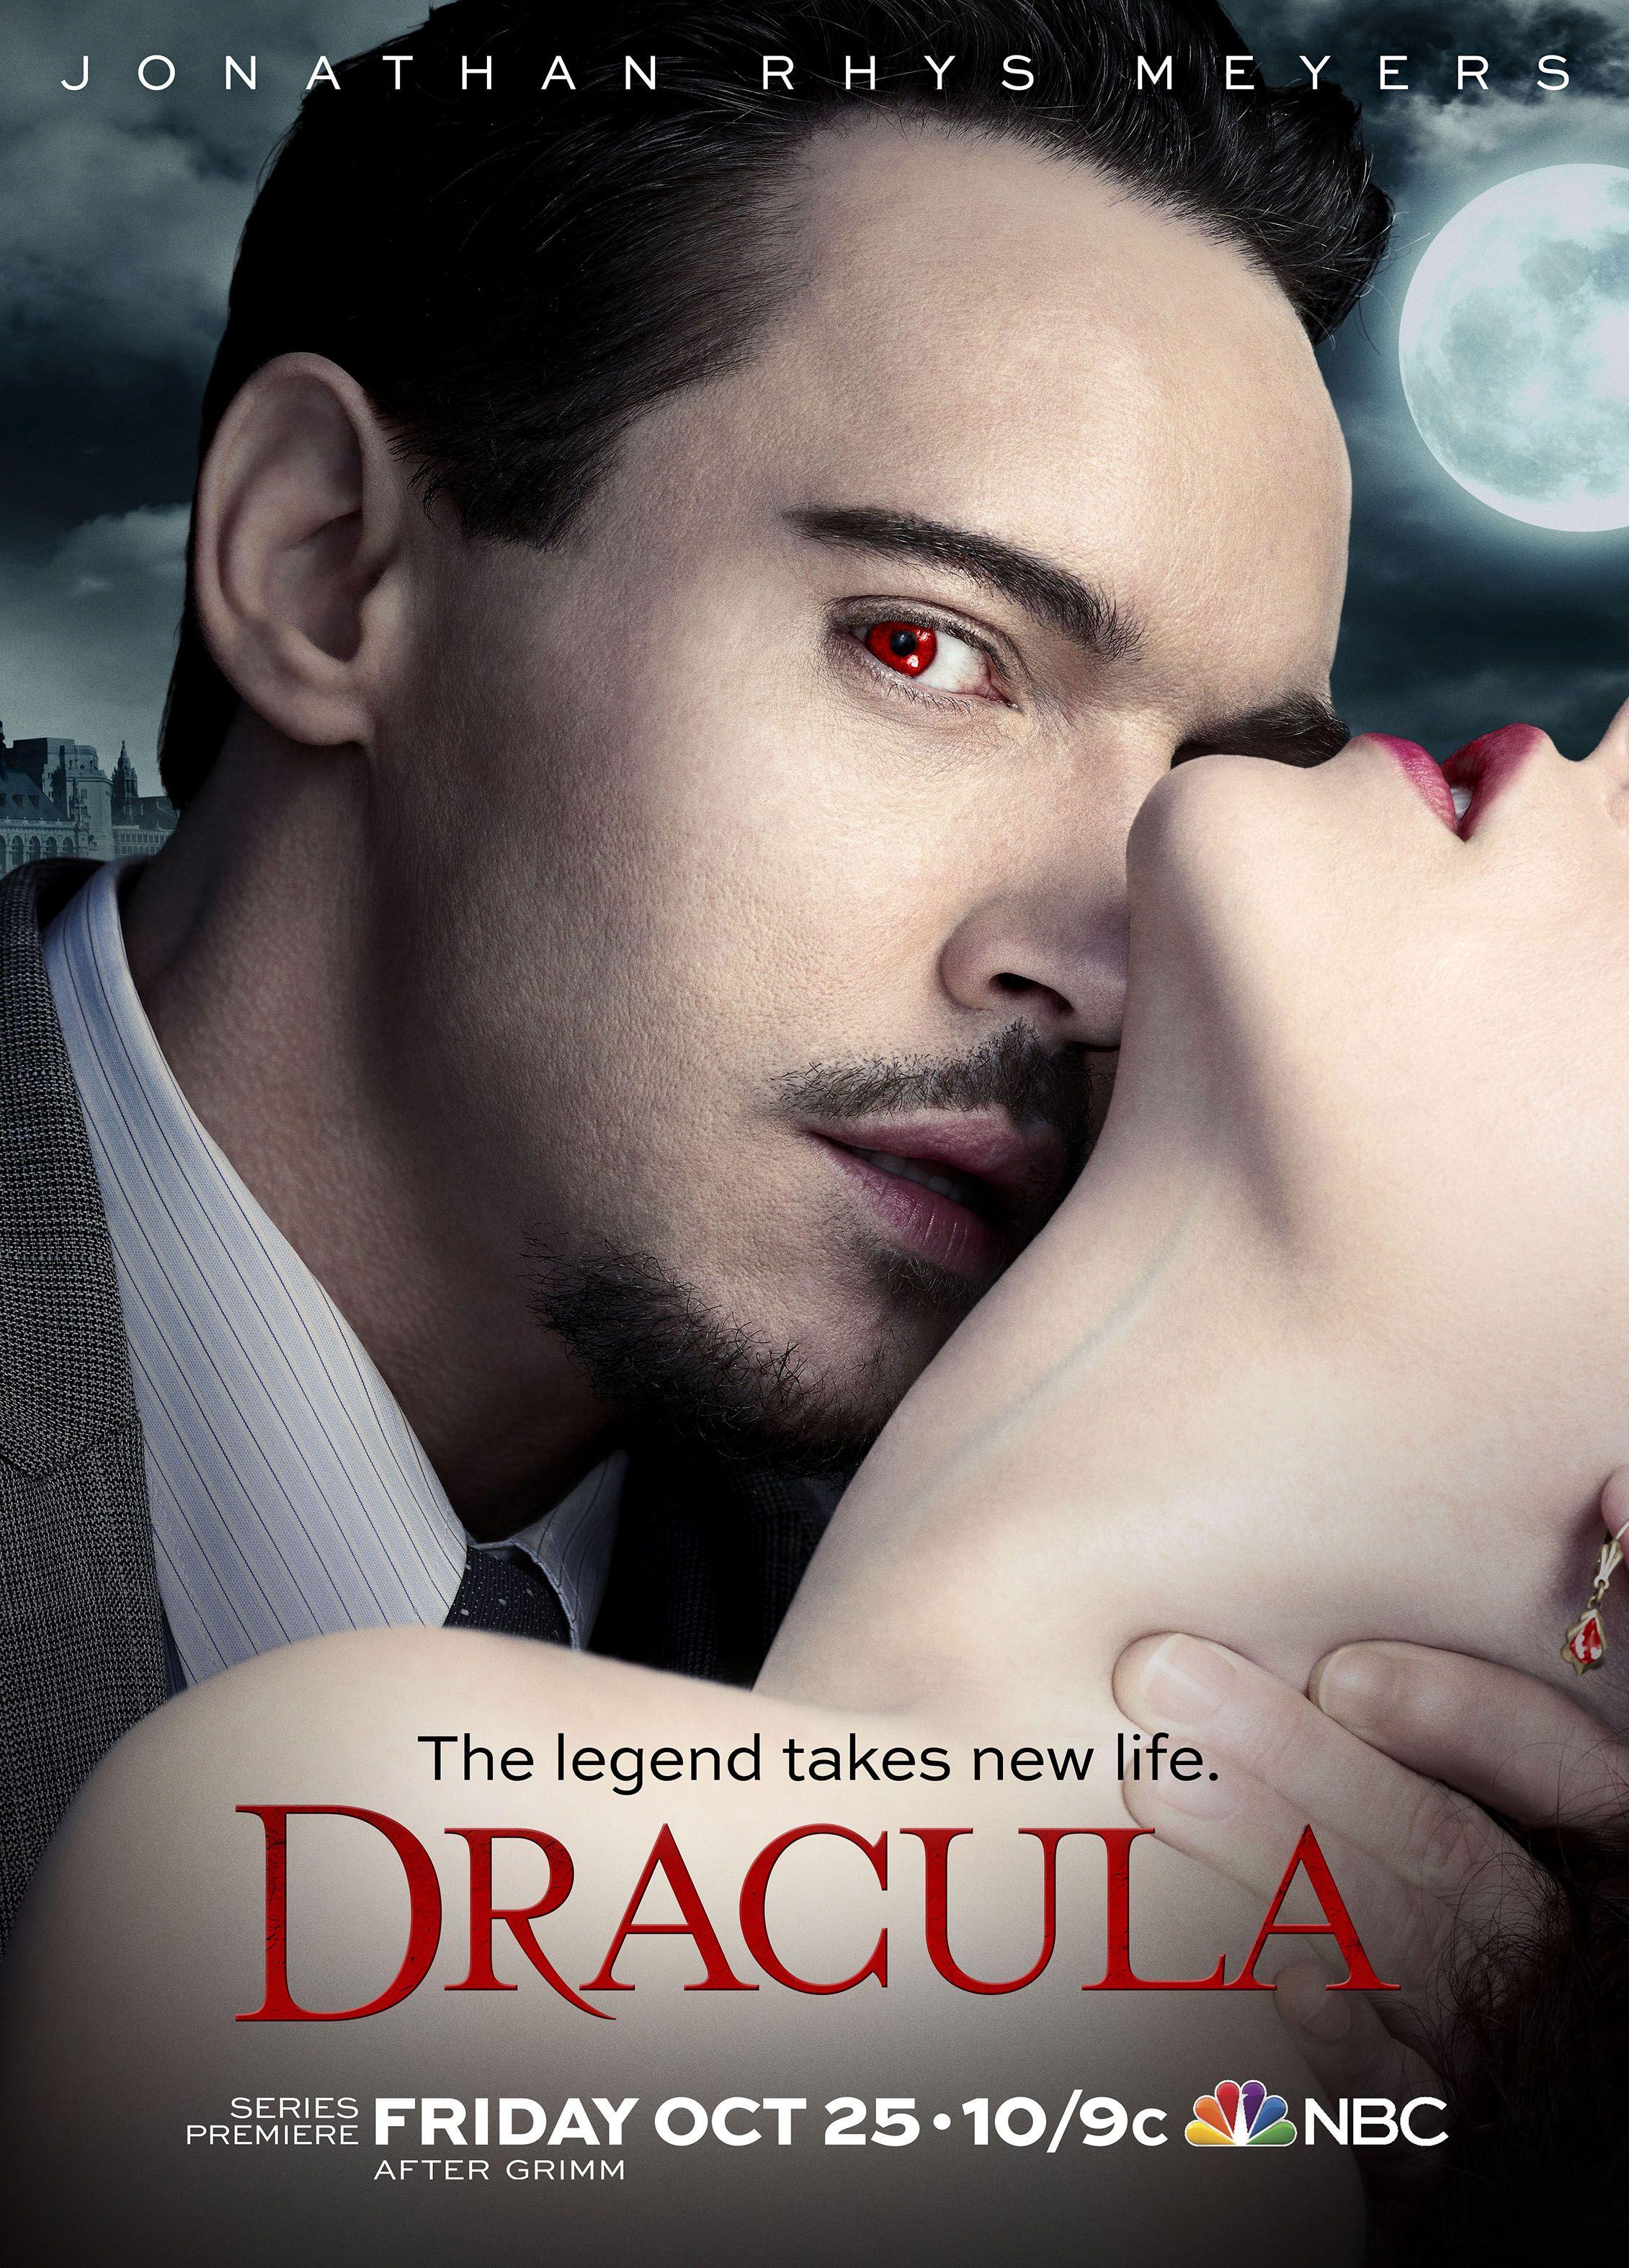 Dracula Premieres October 25 At 10 9c Dracula Tv Series Dracula Tv Dracula Series